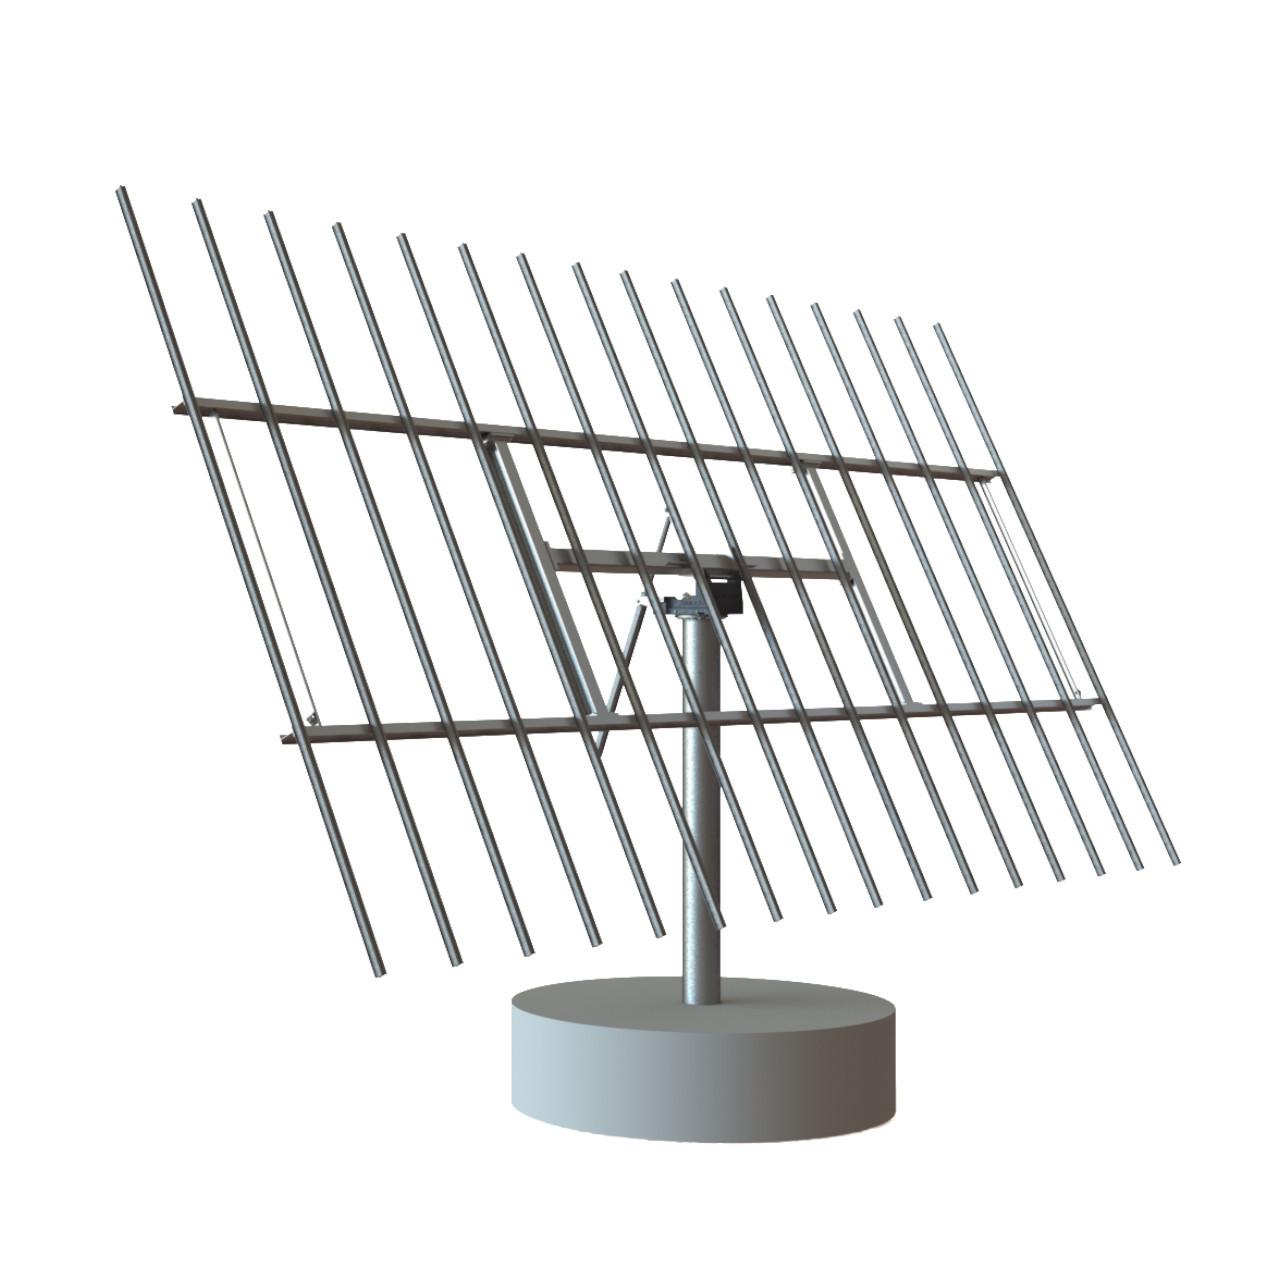 Deger - Dual Axis Tracker D100H